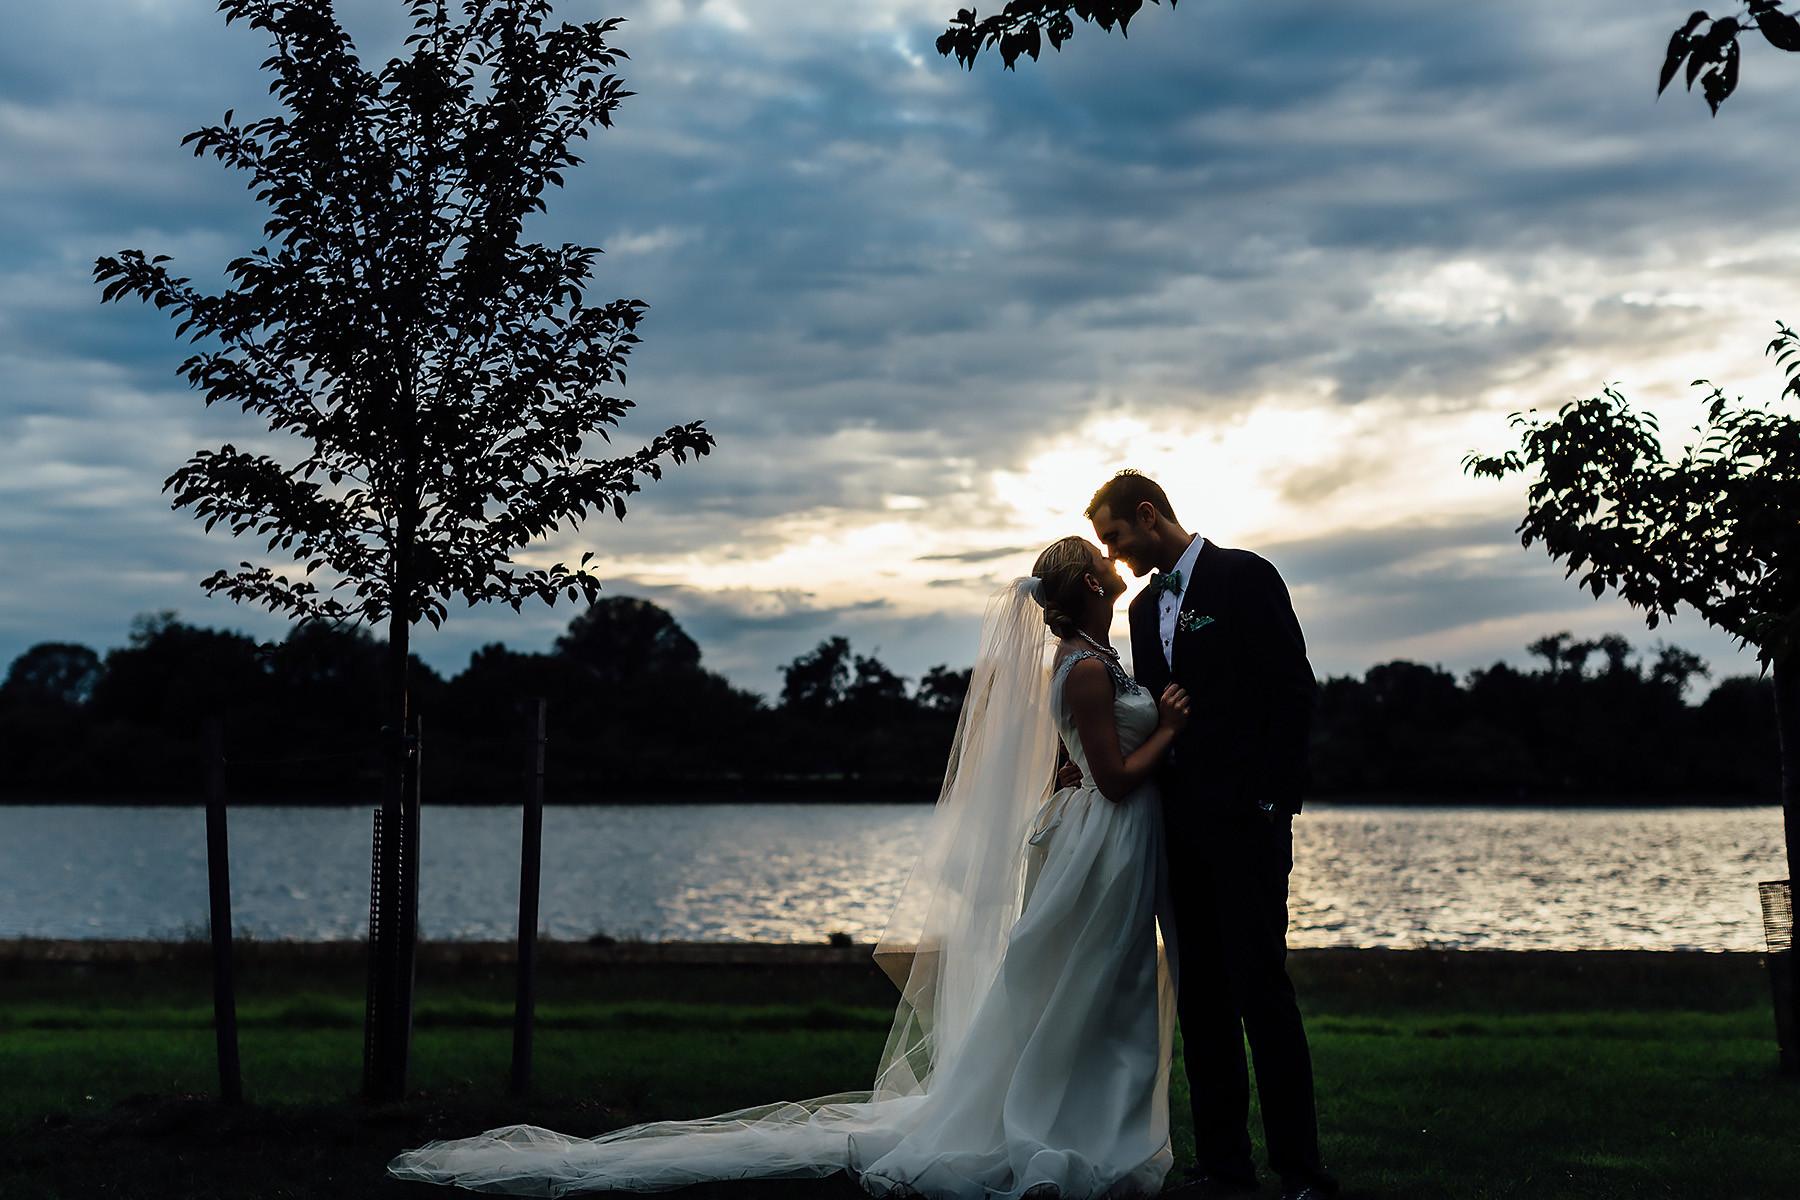 Washington, DC Bride & Groom Sunset Portrait